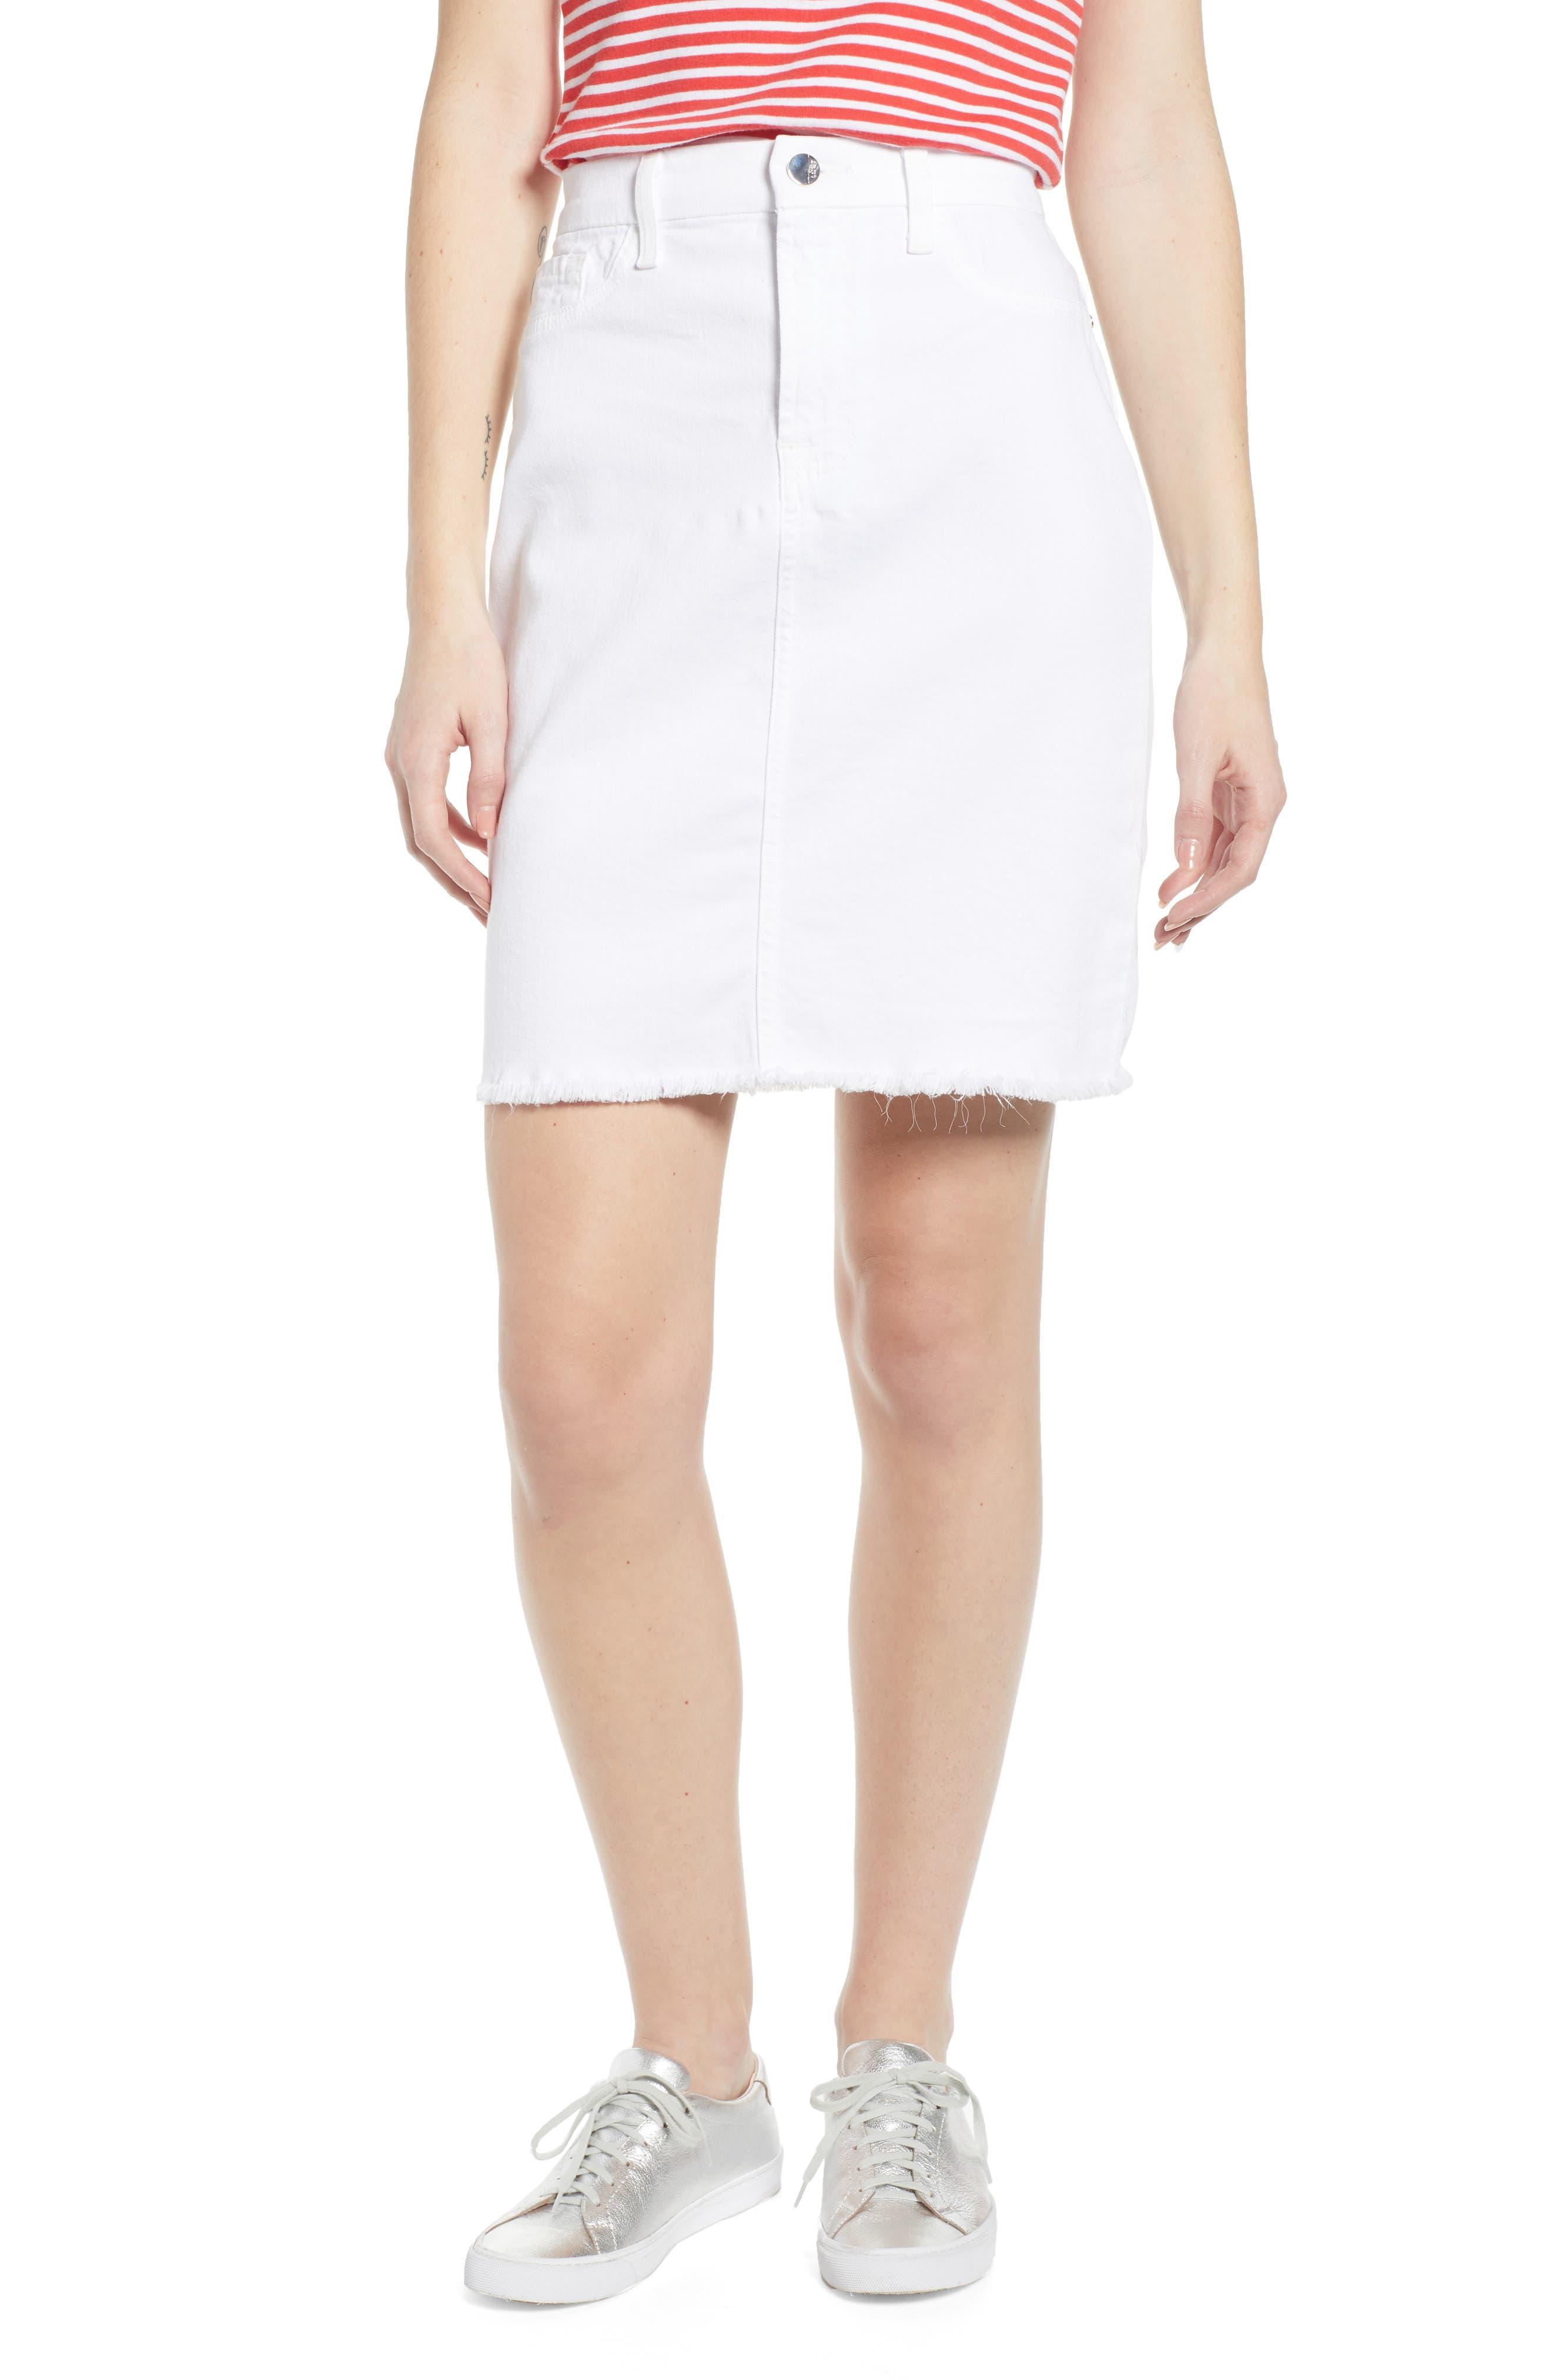 JEN7 BY 7 FOR ALL MANKIND, Frayed Hem Denim Pencil Skirt, Main thumbnail 1, color, WHITE